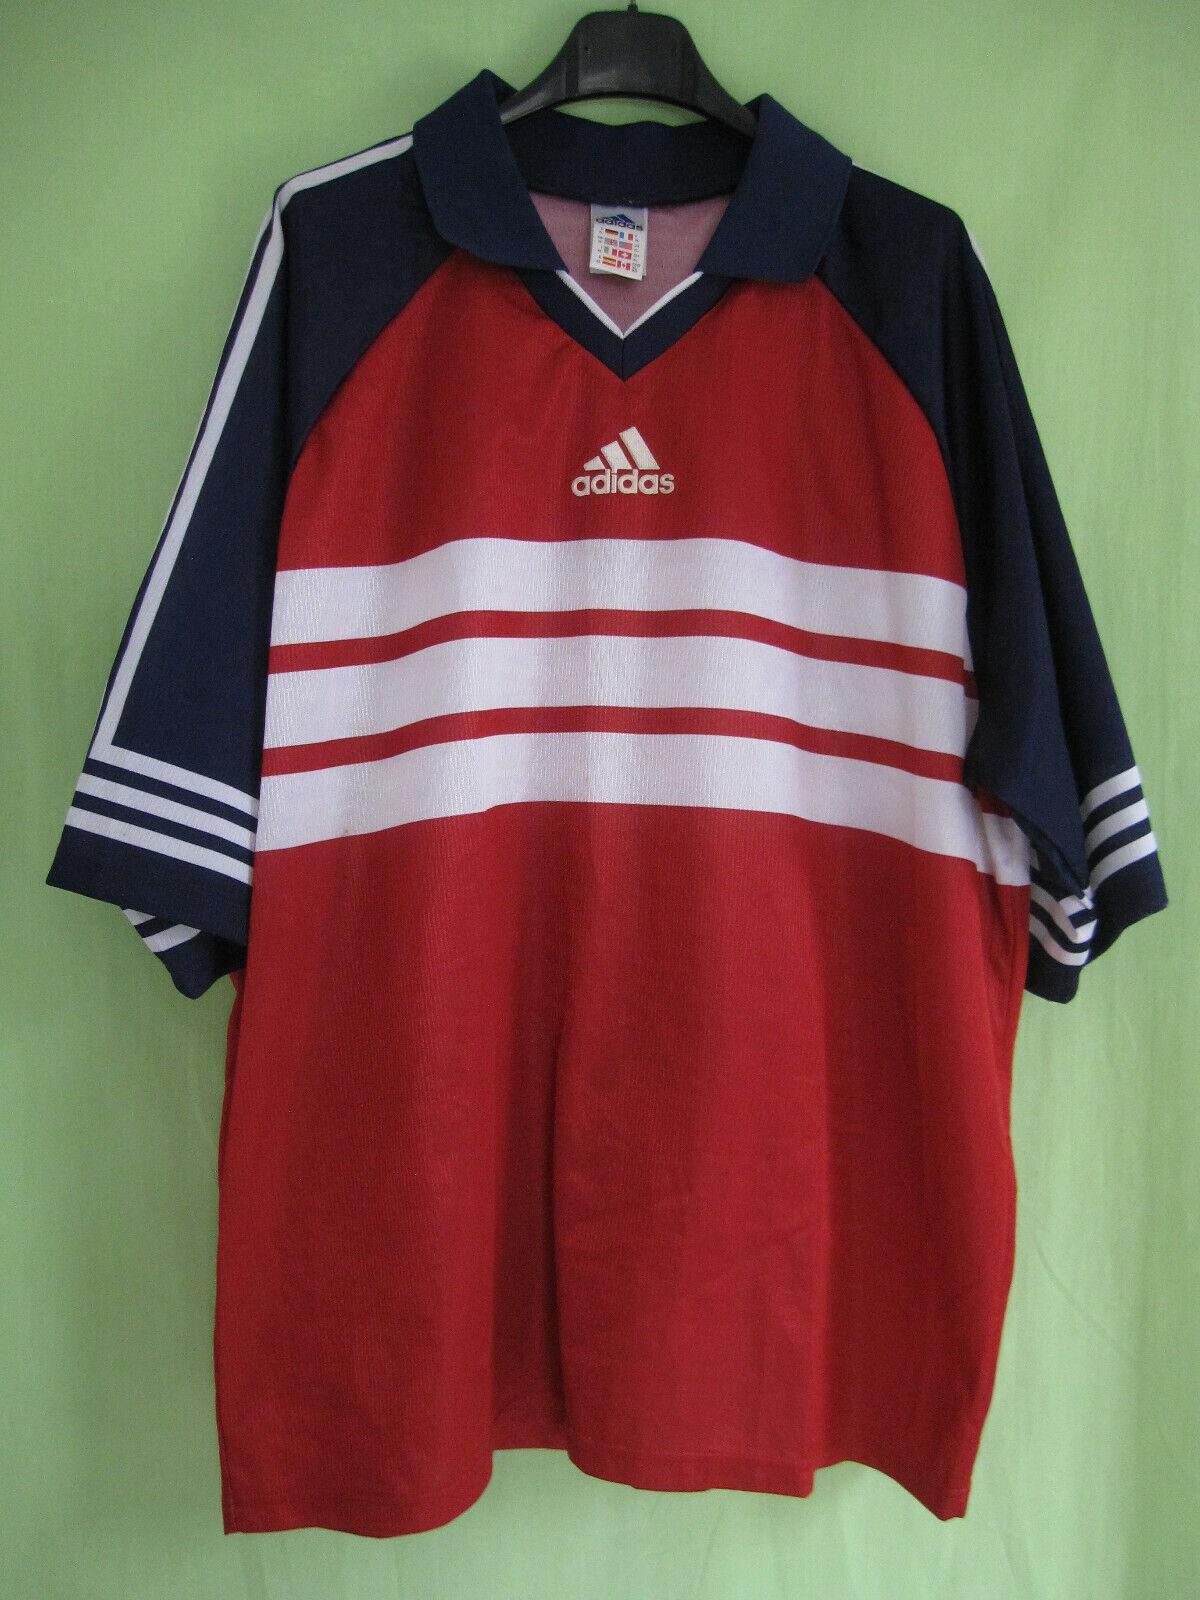 Maillot Adidas vintage Jersey Football color Bayern Munich Jersey - XL